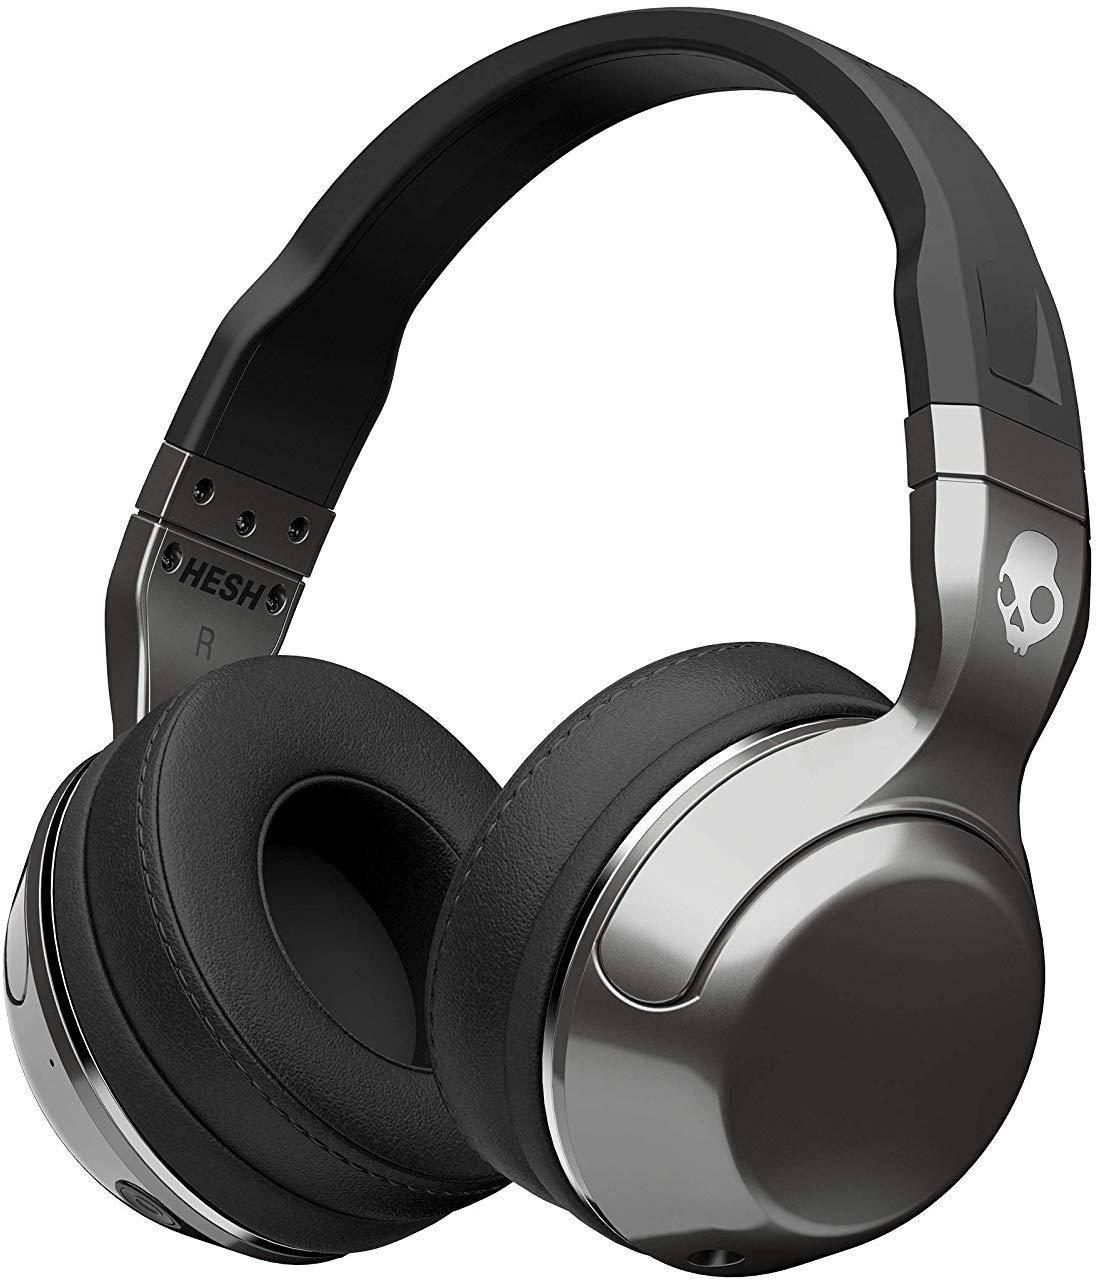 Skullcandy Hesh 2 Wireless Over The Ear Headphone With Mic zoom image